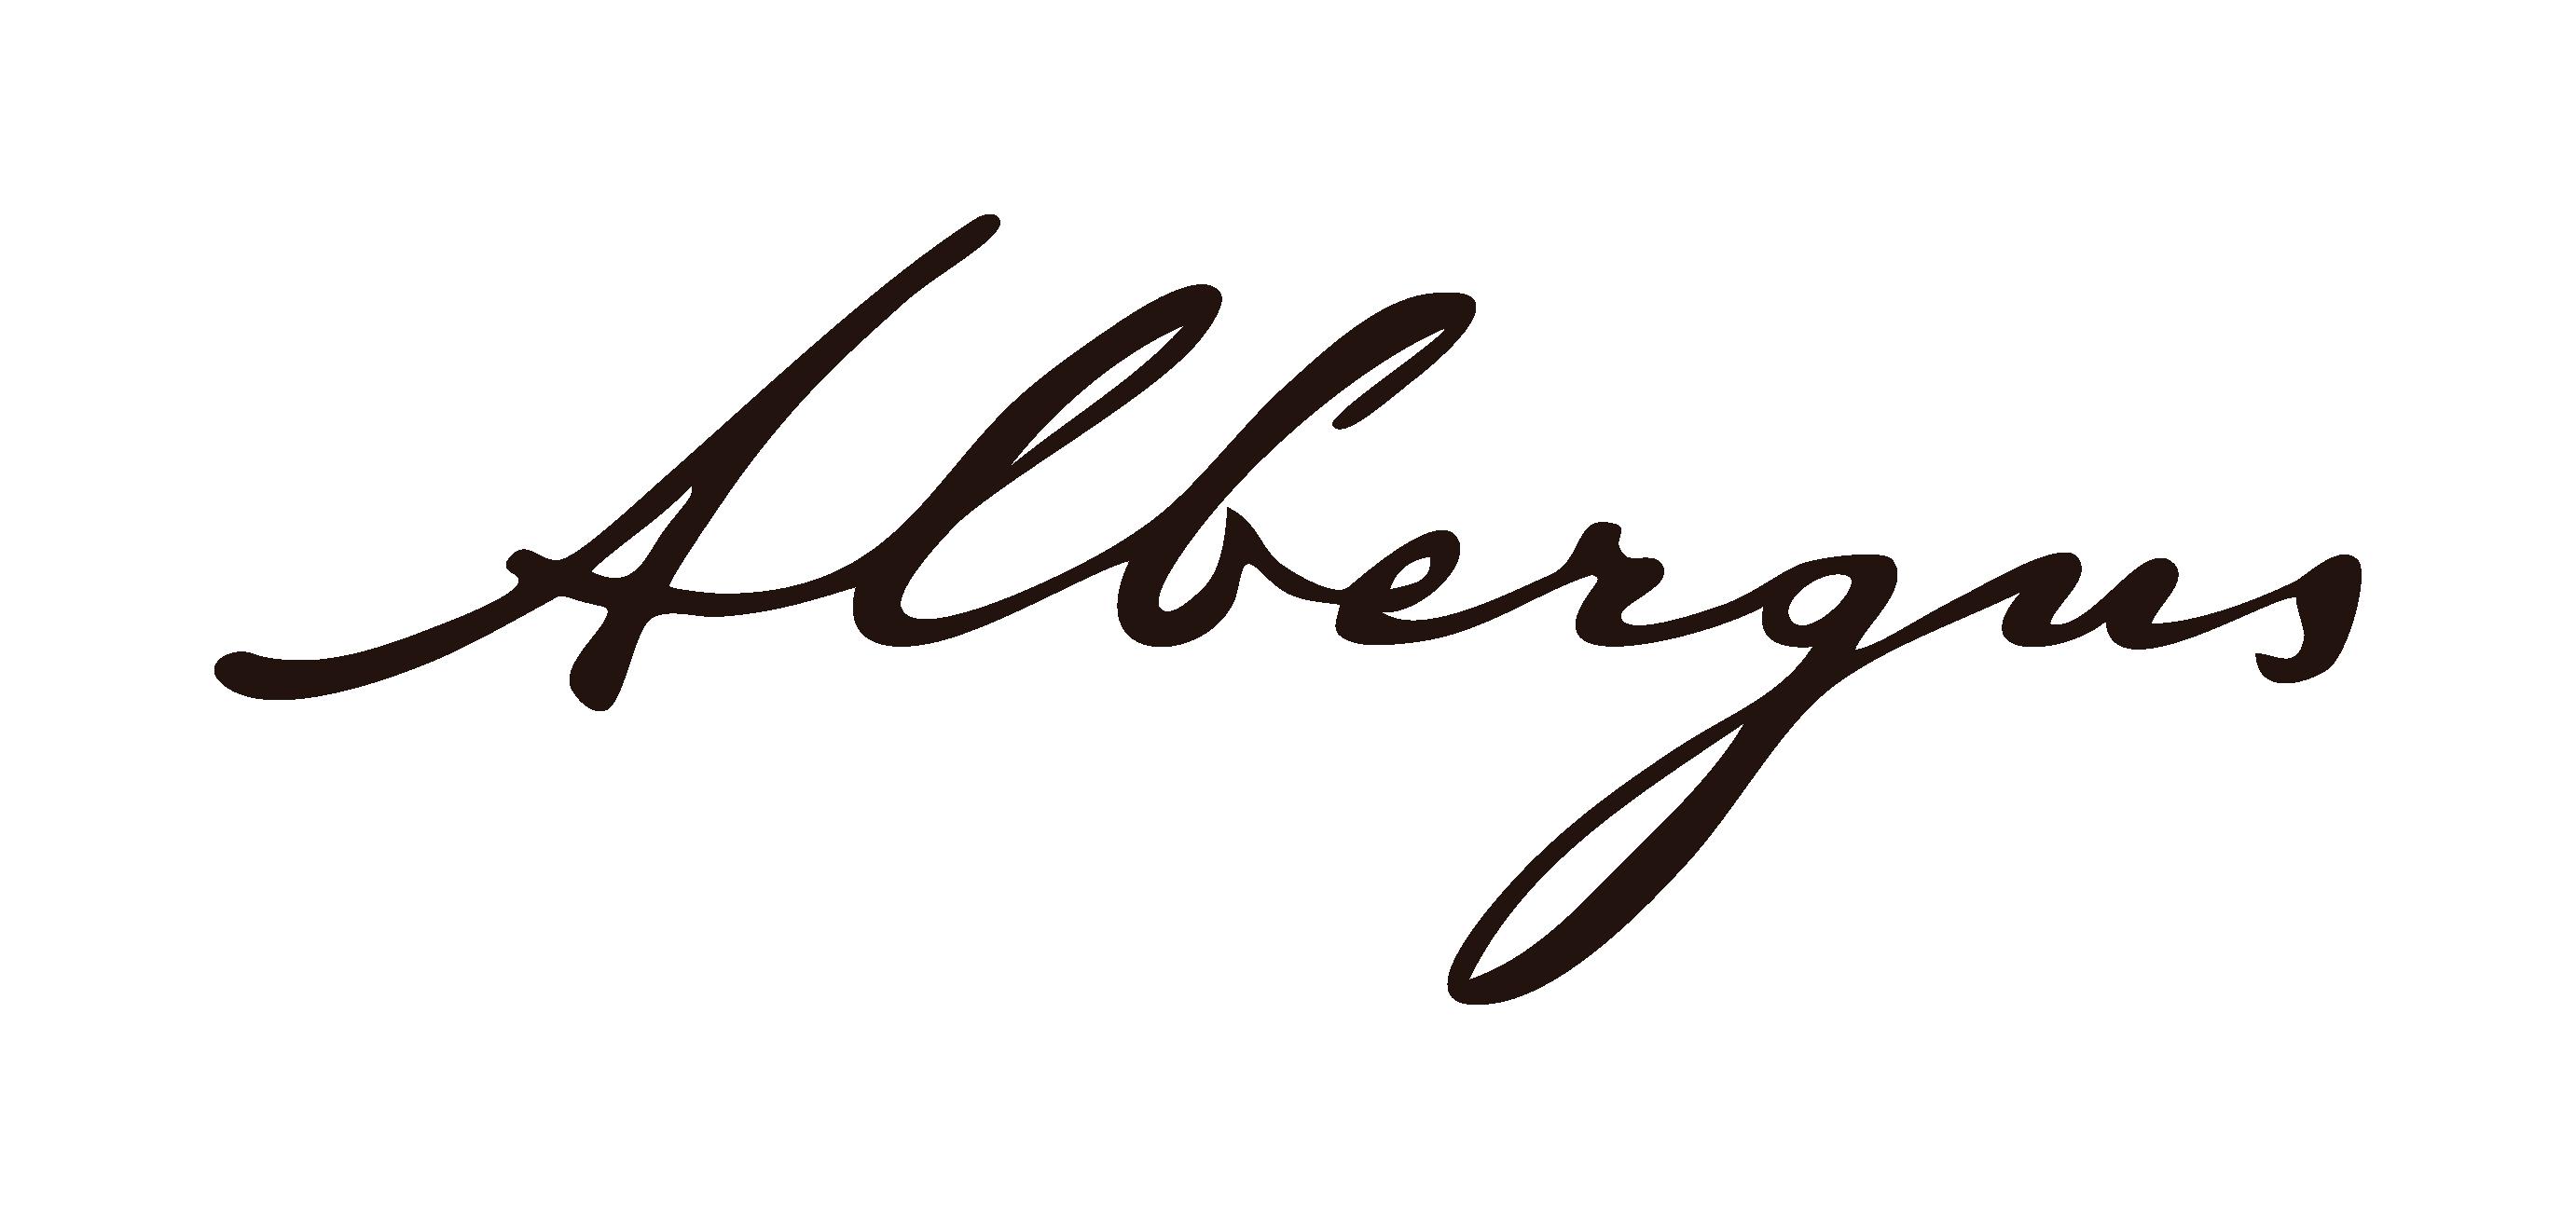 Albergus